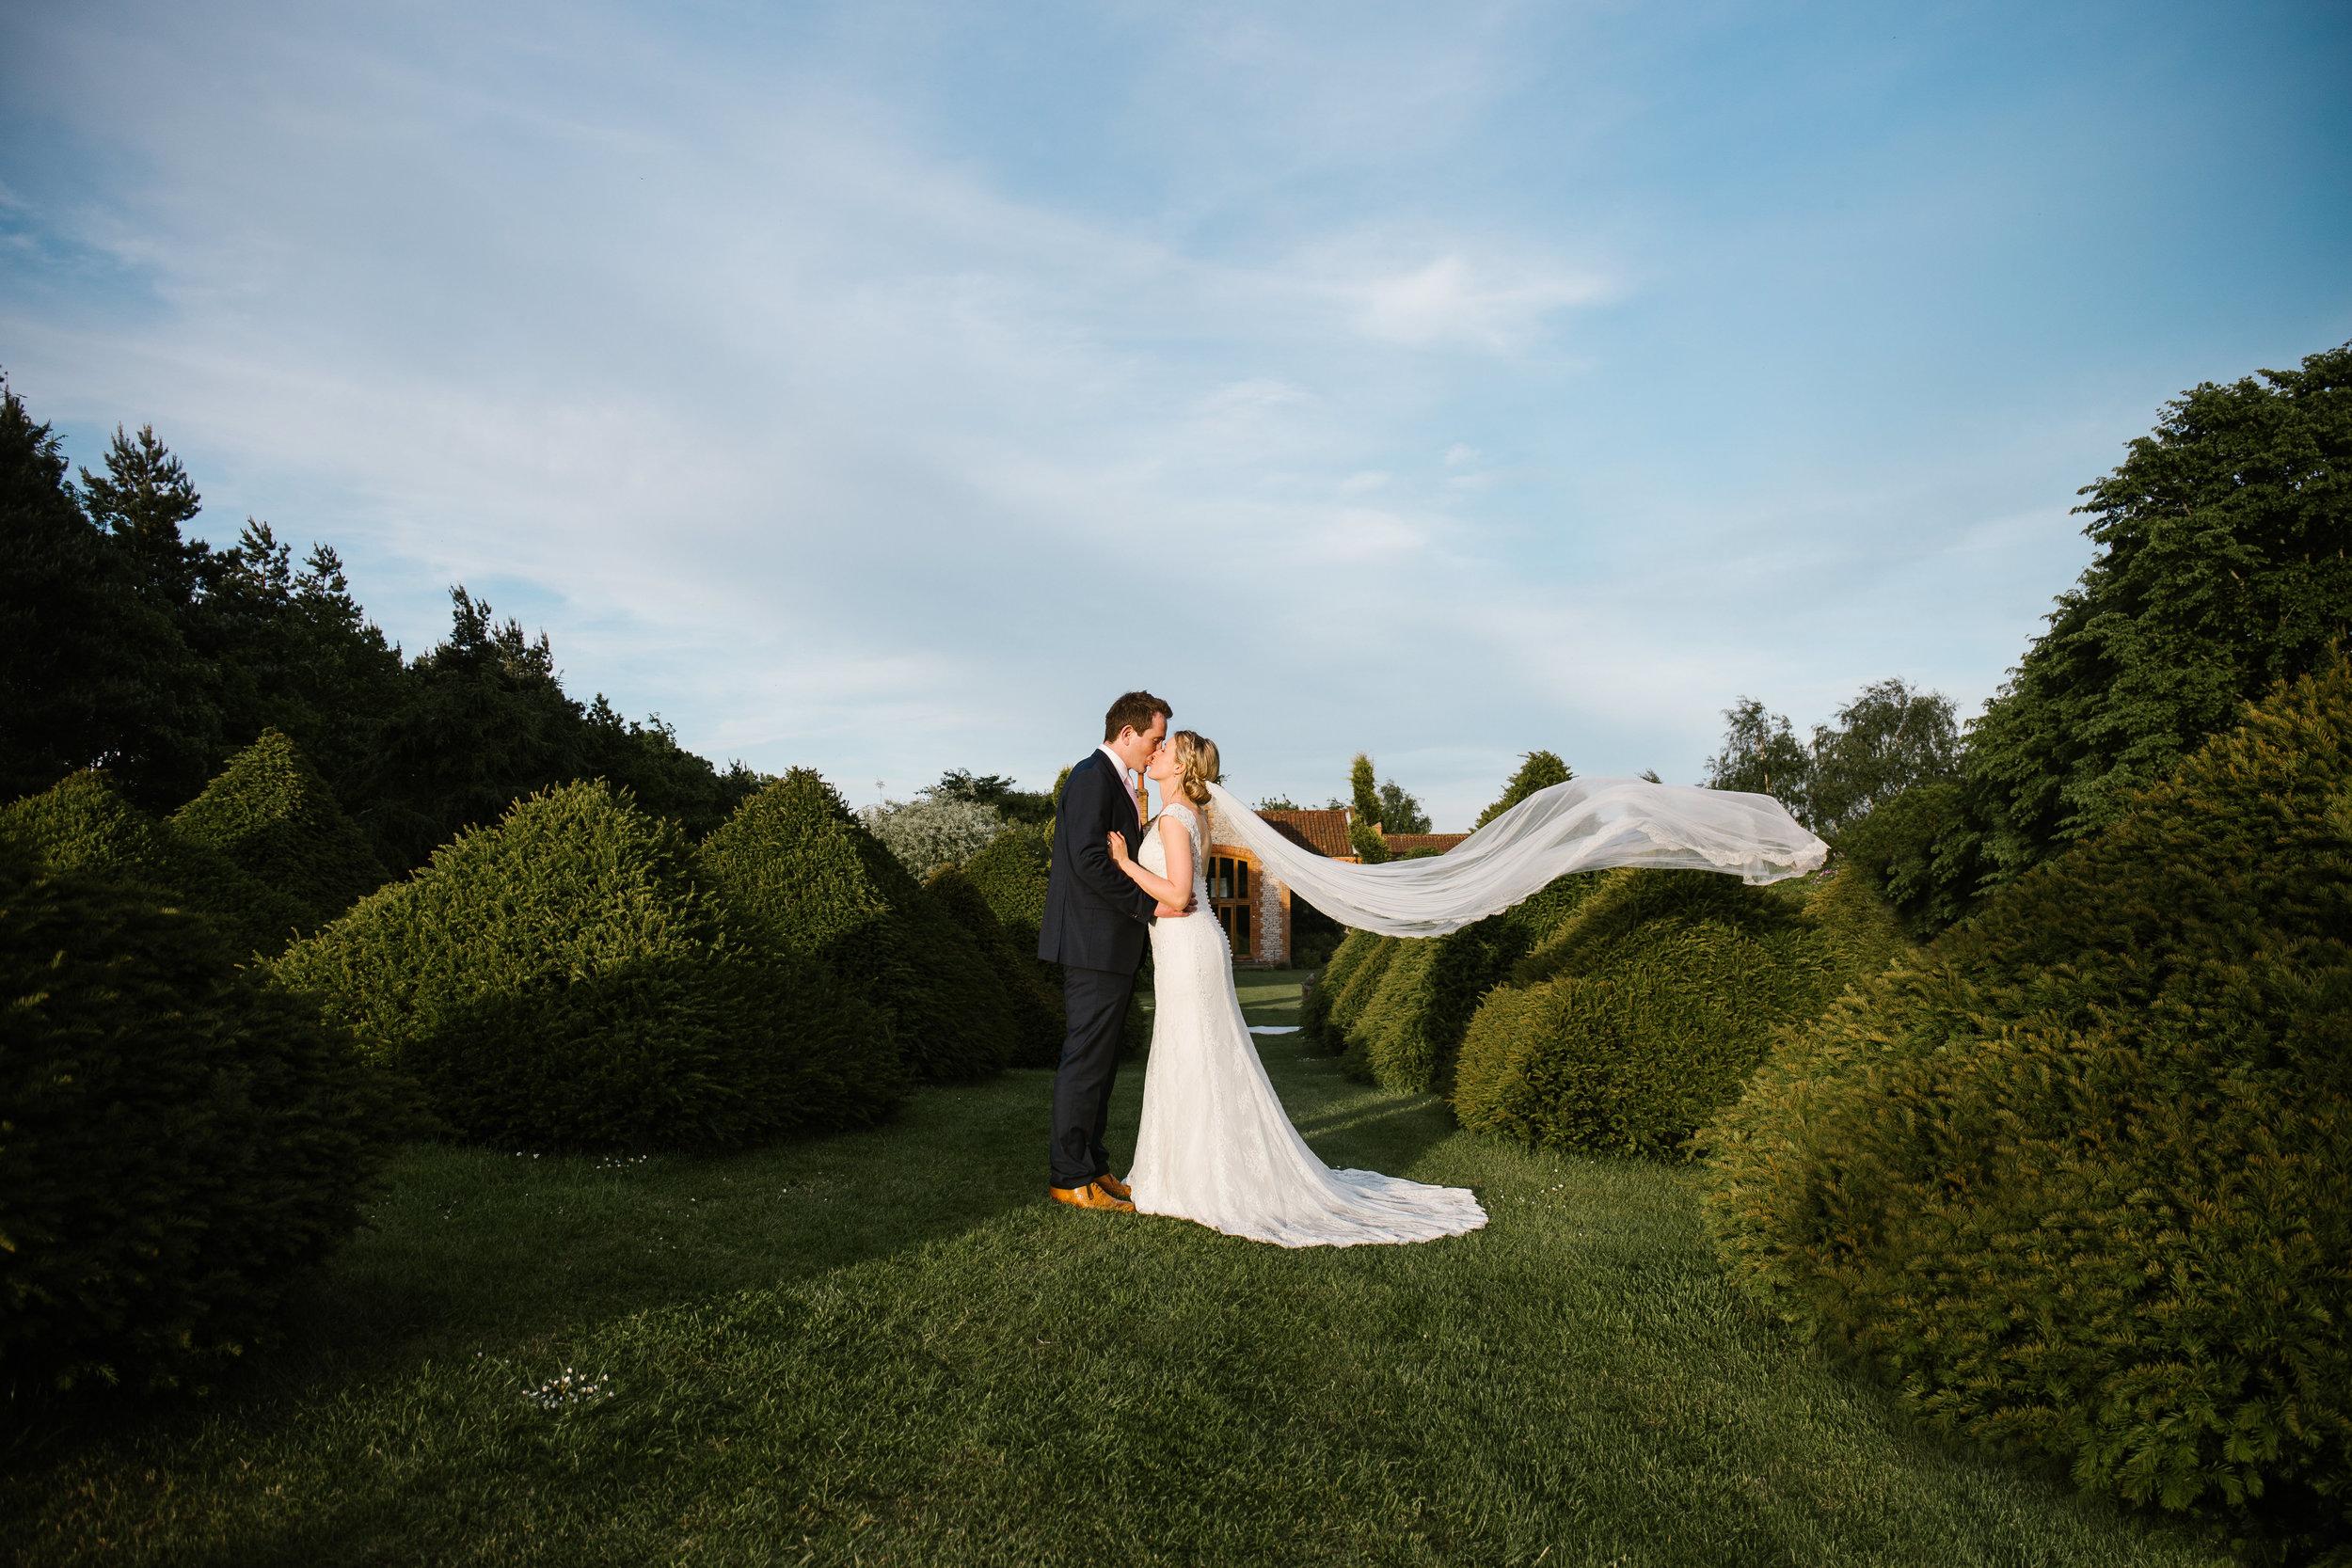 Beth + Will, Chaucer Barns, Chaucer Barns Wedding, Spring Wedding-301.jpg